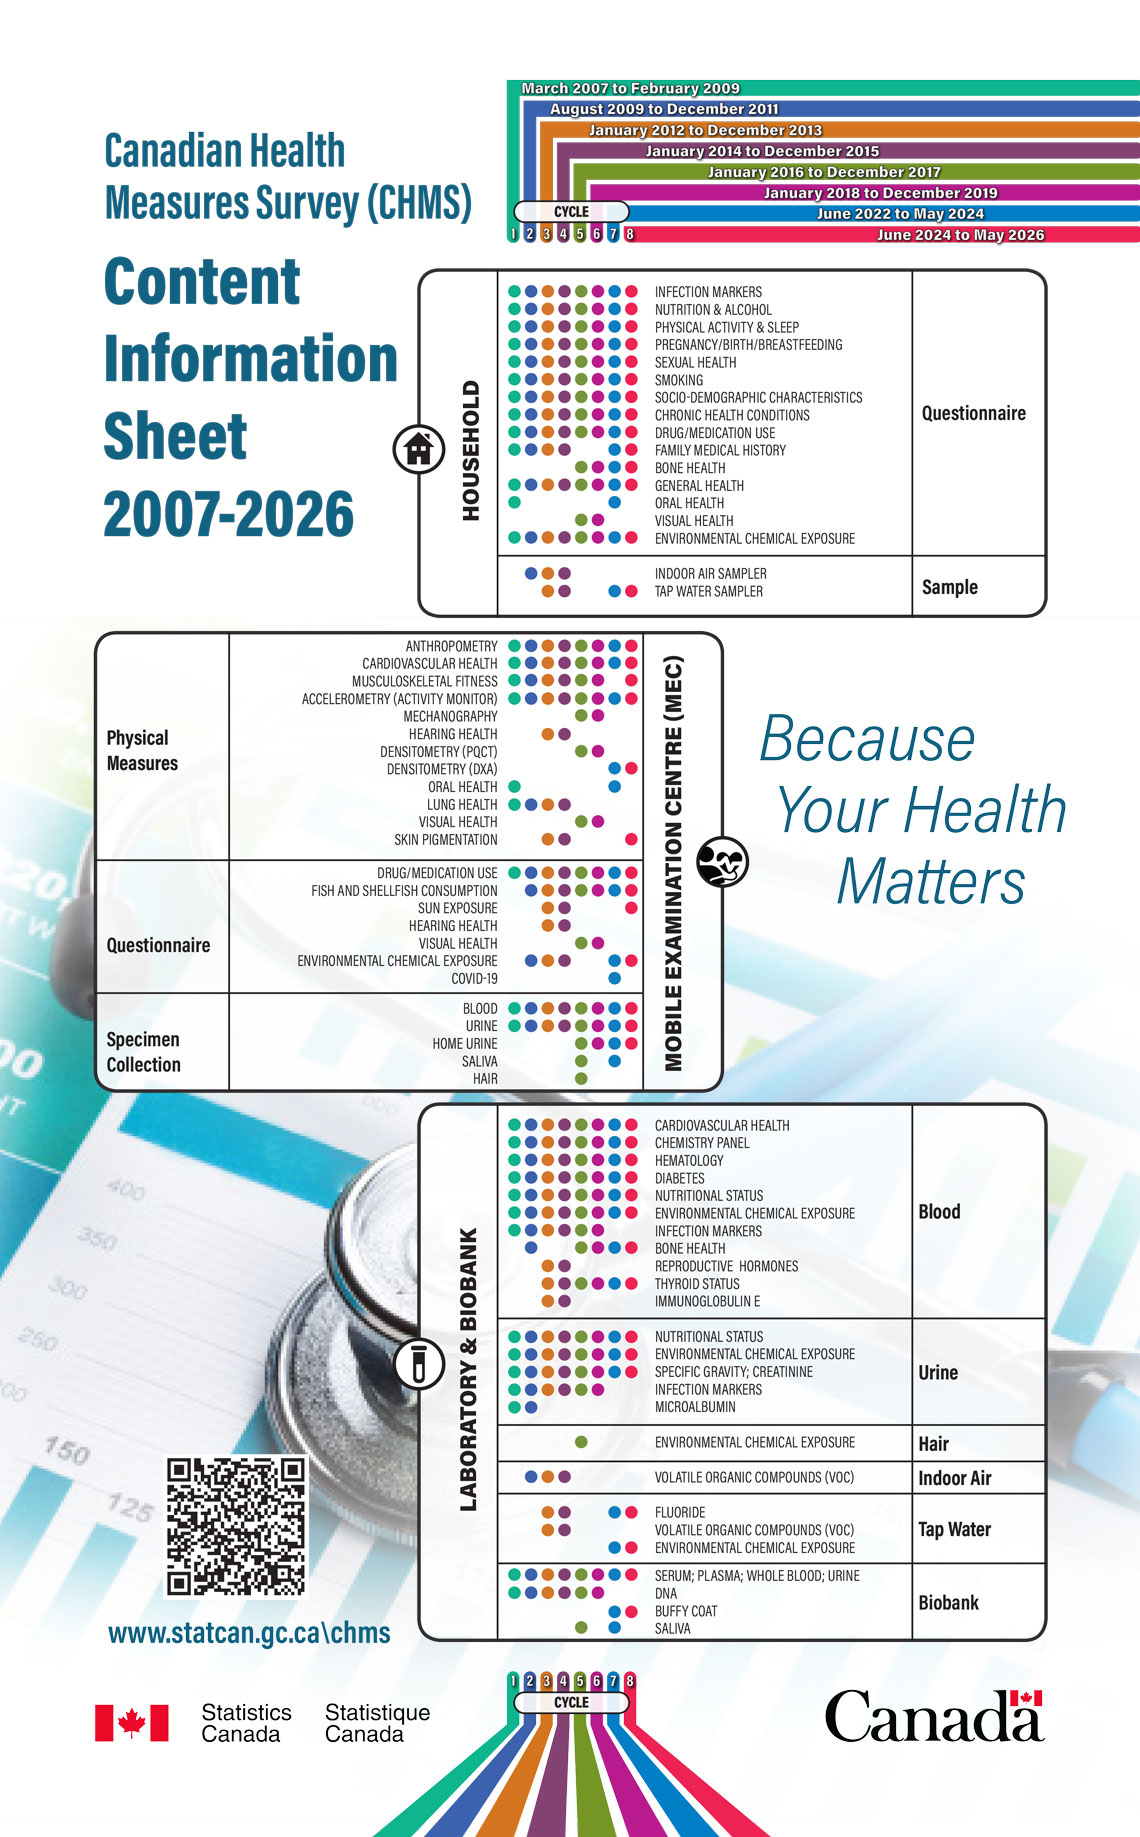 Canadian Health Measures Survey Chms Content Information Sheet